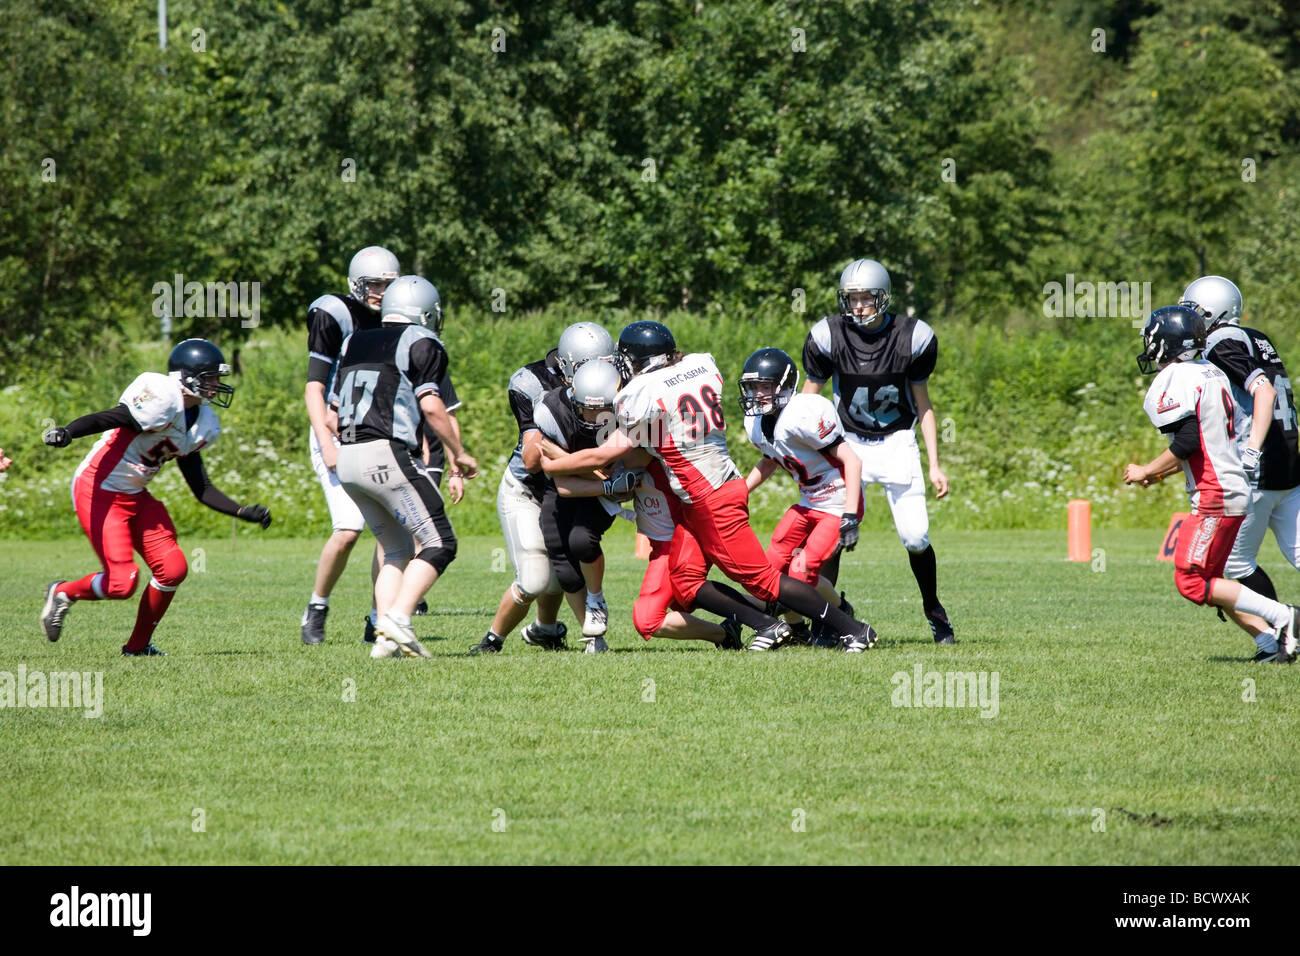 Junior American football game action Lappeenranta Finland - Stock Image